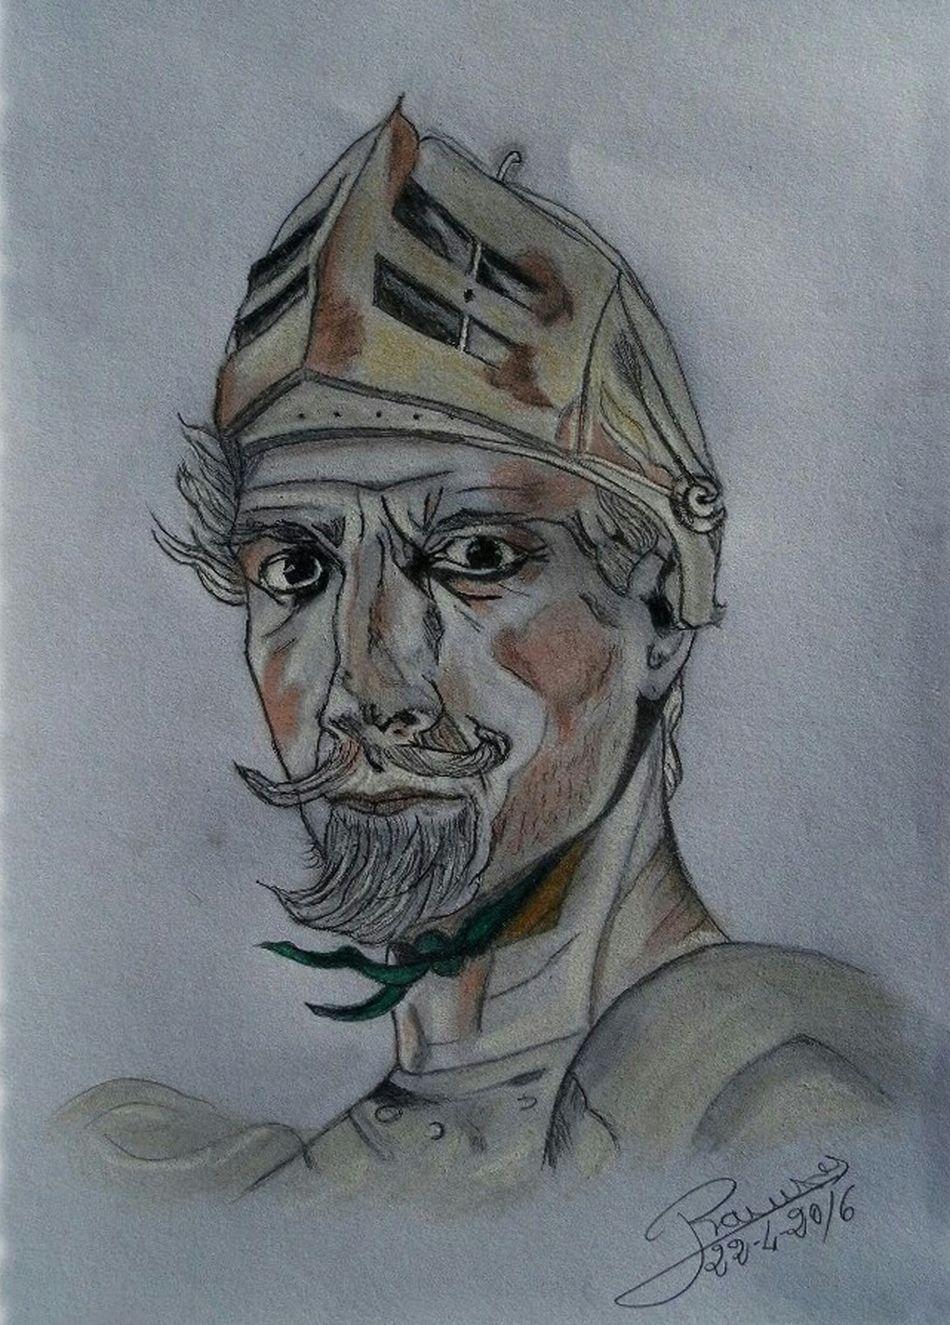 Quixote Quixote Quijote Dibujo Pintura Pinturas Grafito Art Deco Art Artistic Ramses Arte ArtWork Art, Drawing, Creativity